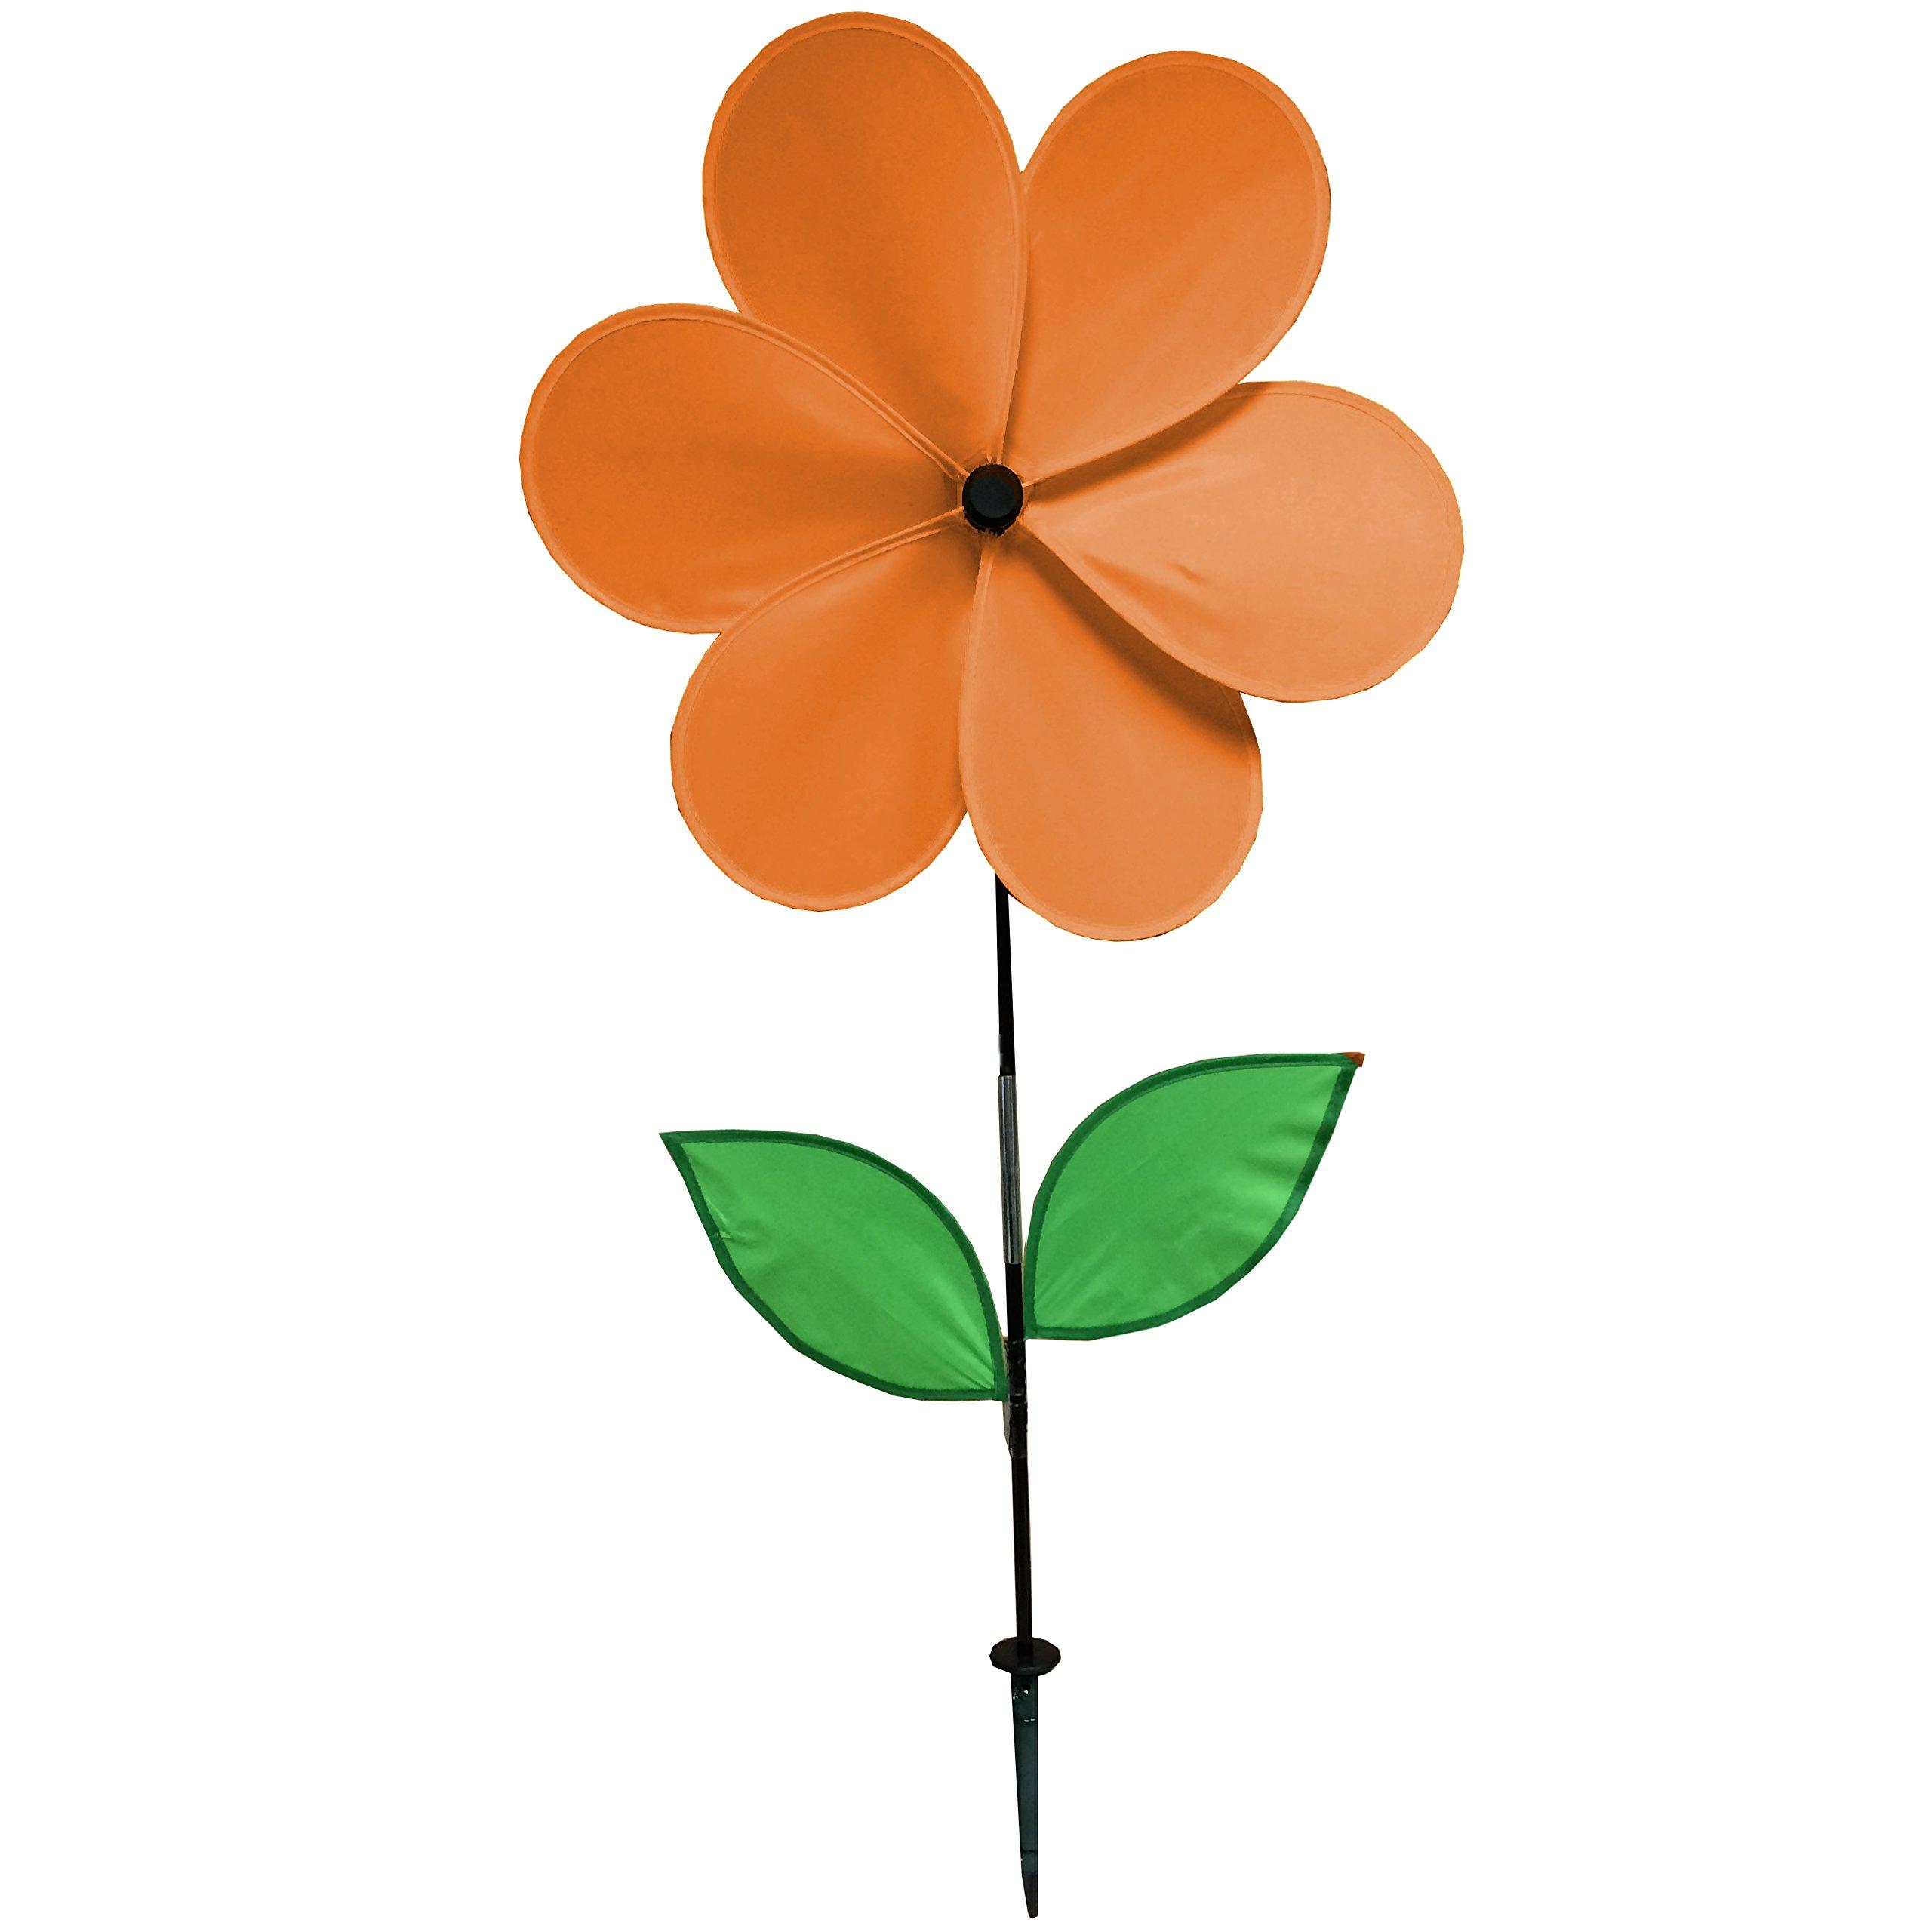 Gardener's Select 6 Petal Pin Wheel, Orange, 18 by 28''